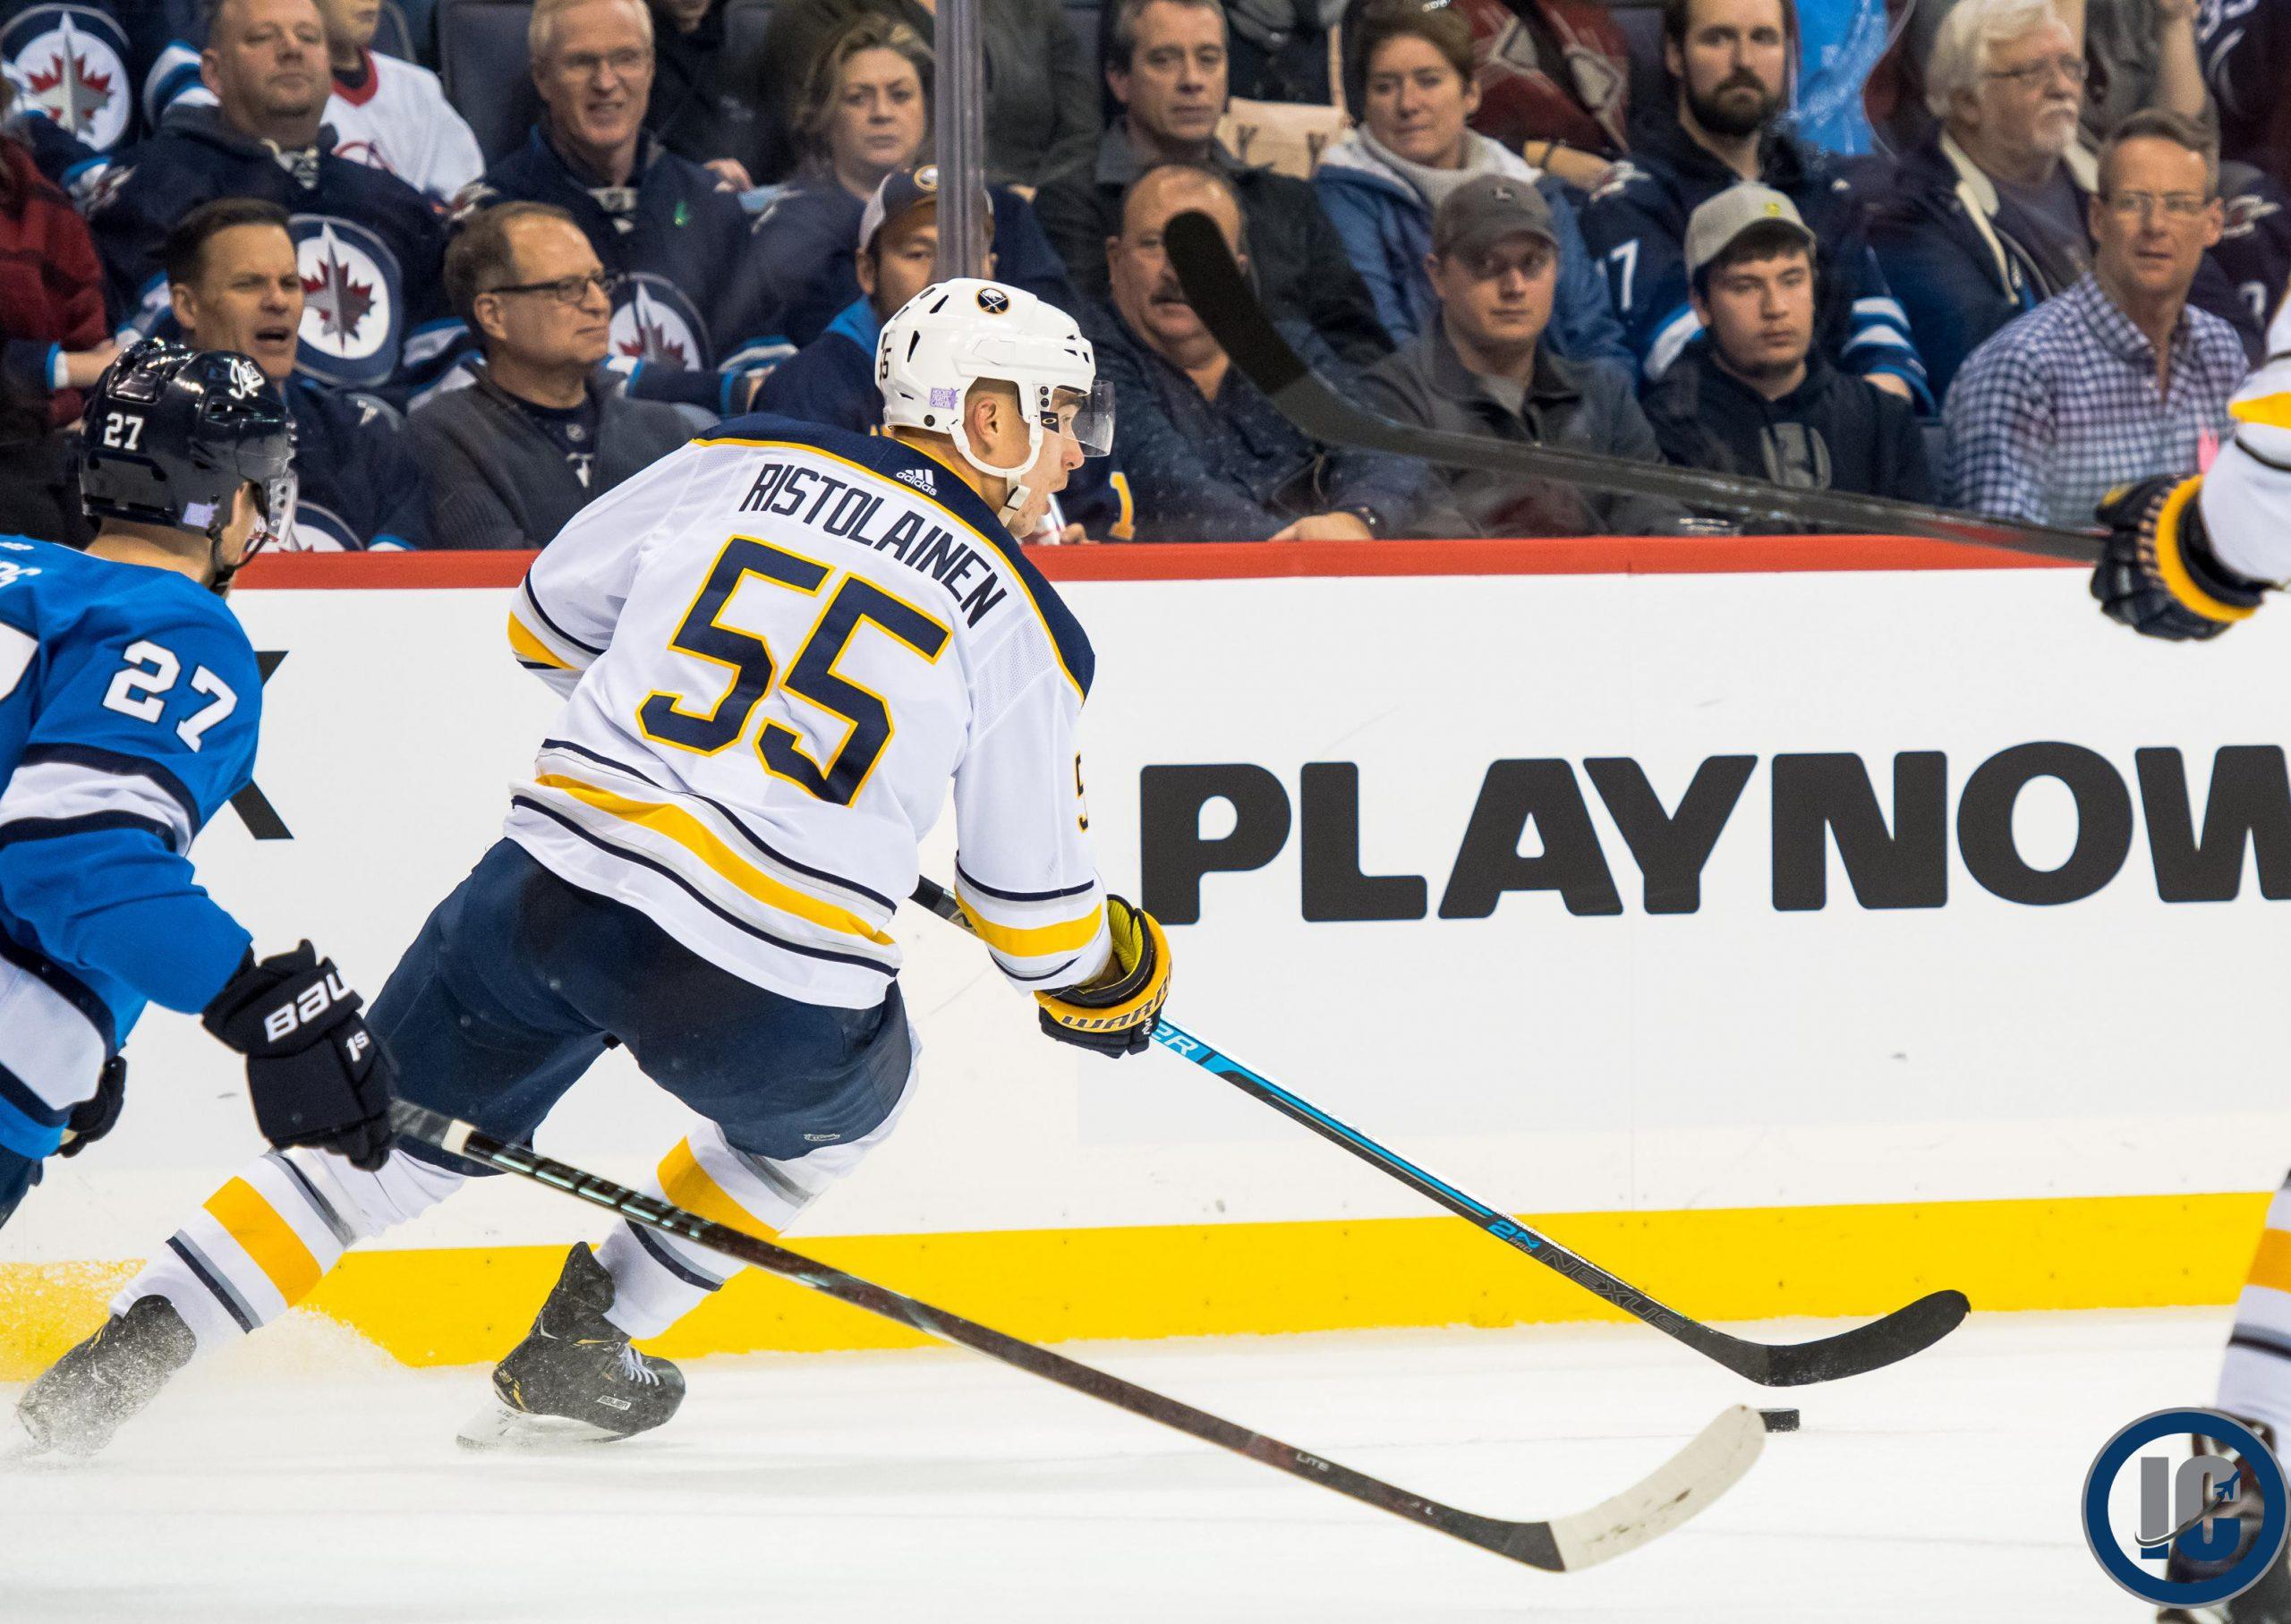 Tsn Hockey Insider Darren Dreger Chats About Winnipeg Jets On Tsn 1290 Illegal Curve Hockey